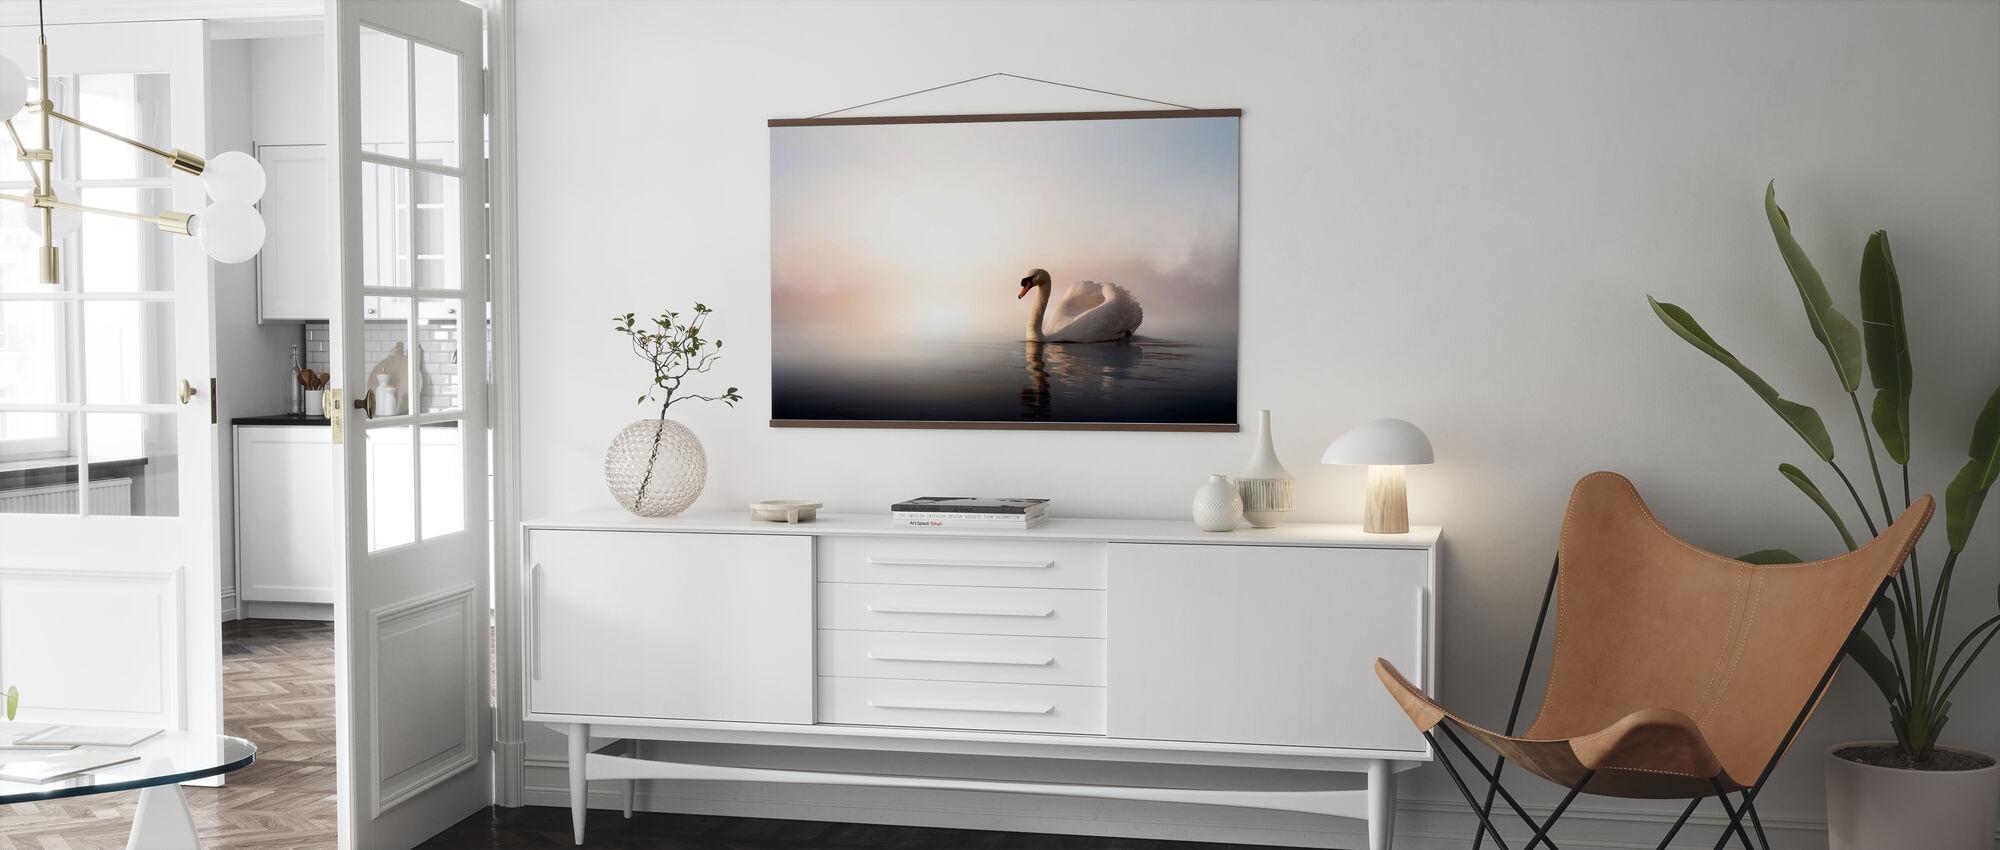 Swan Floating - Poster - Living Room